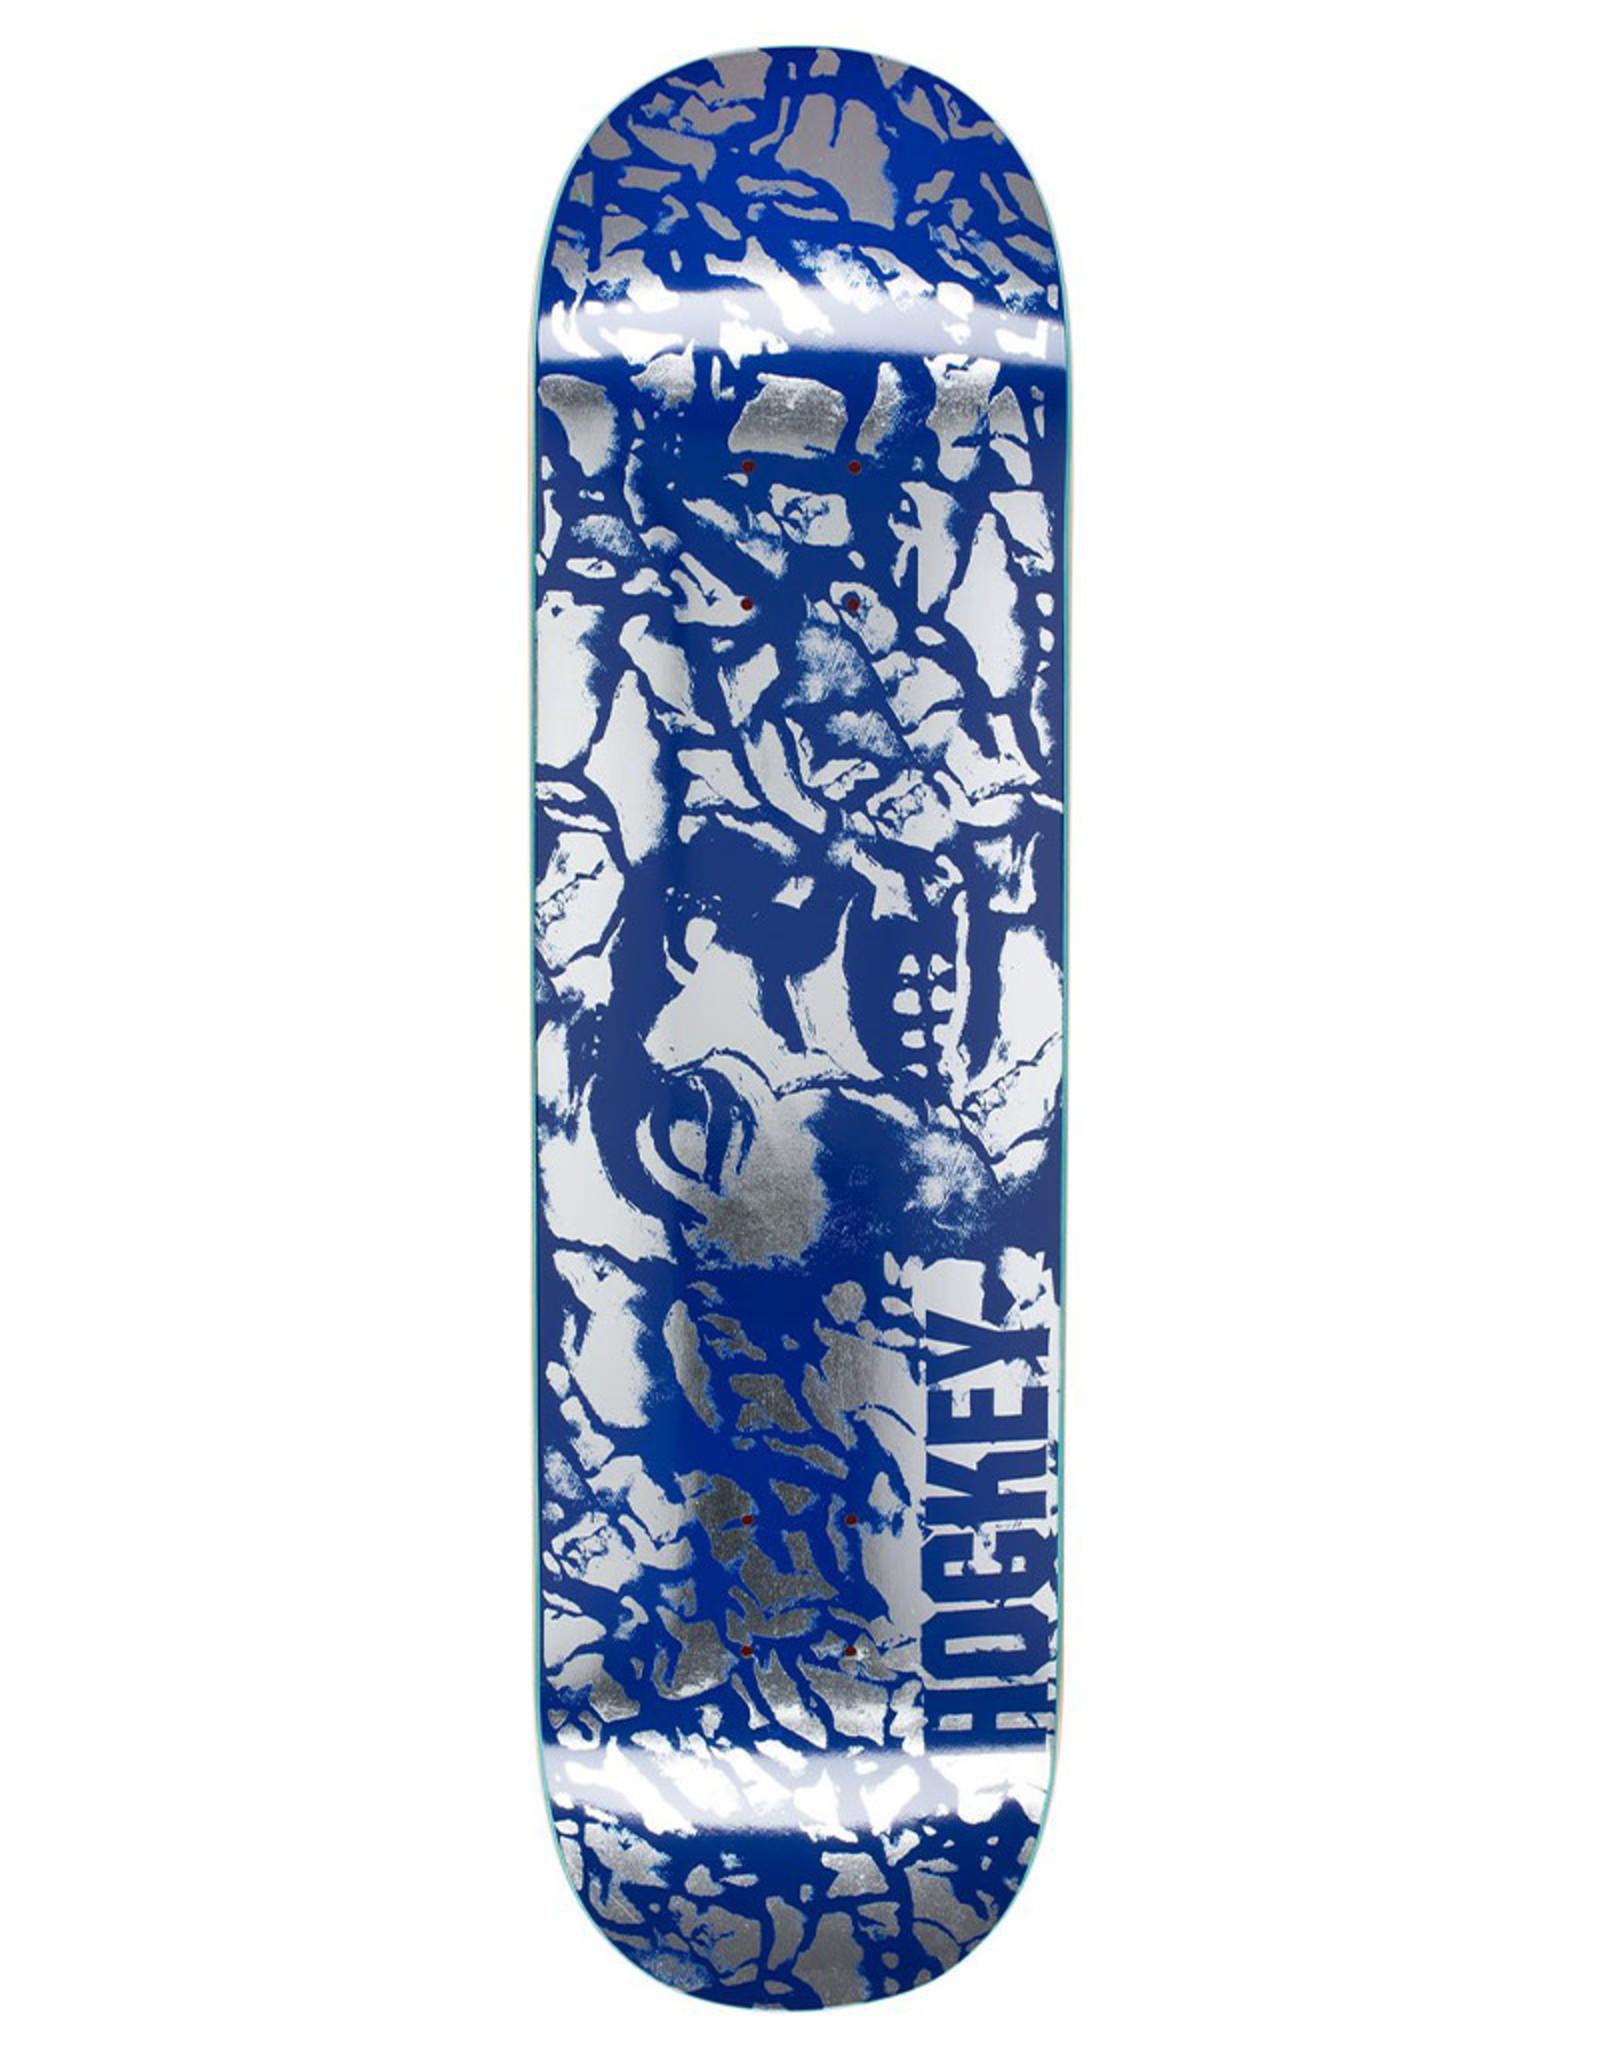 Hockey Hockey Deck John Fitzgerald Stone Foil (8.38)